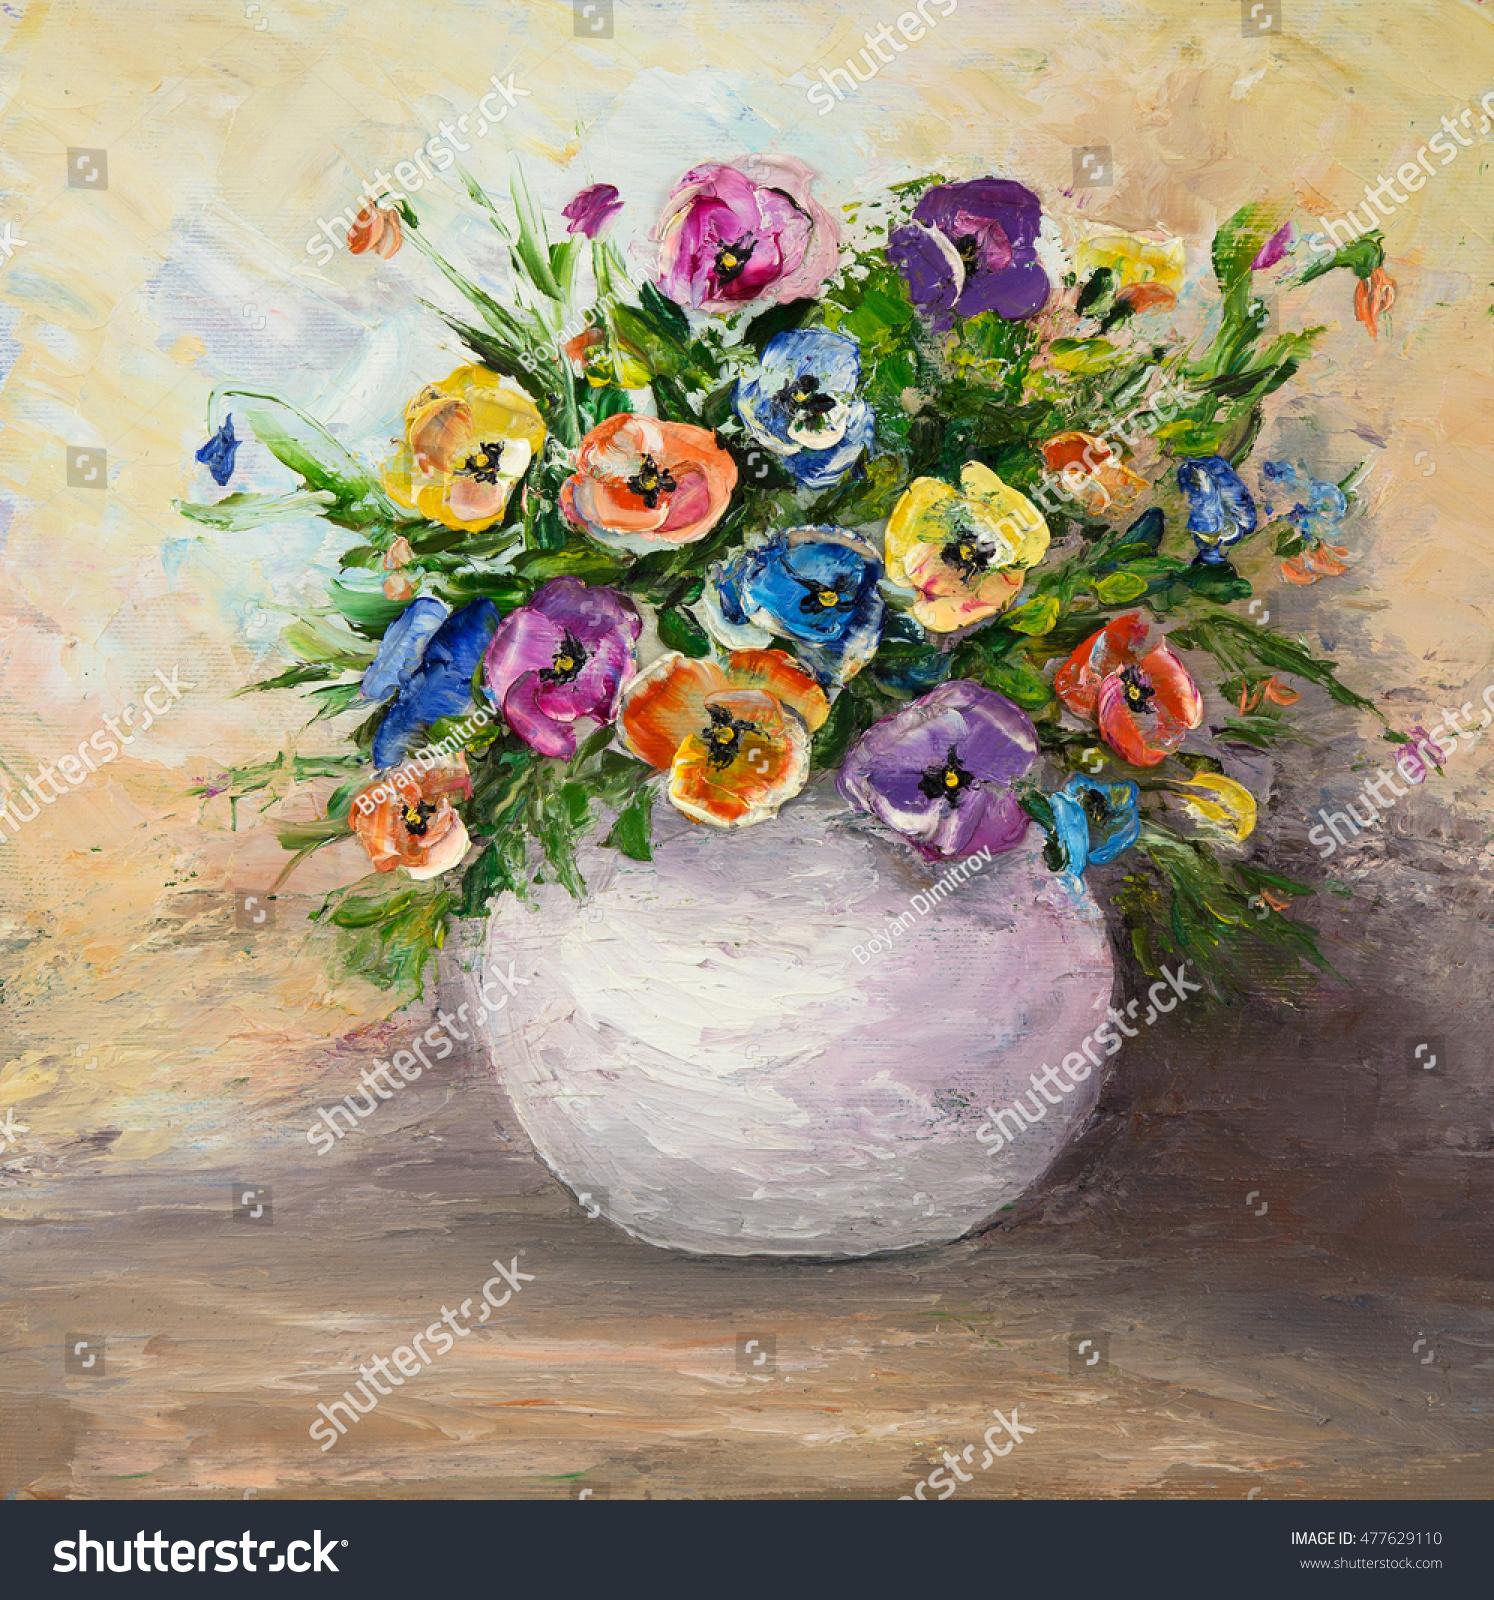 Original oil painting beautiful vase bowl stock illustration original oil painting beautiful vase bowl stock illustration 477629110 shutterstock floridaeventfo Images